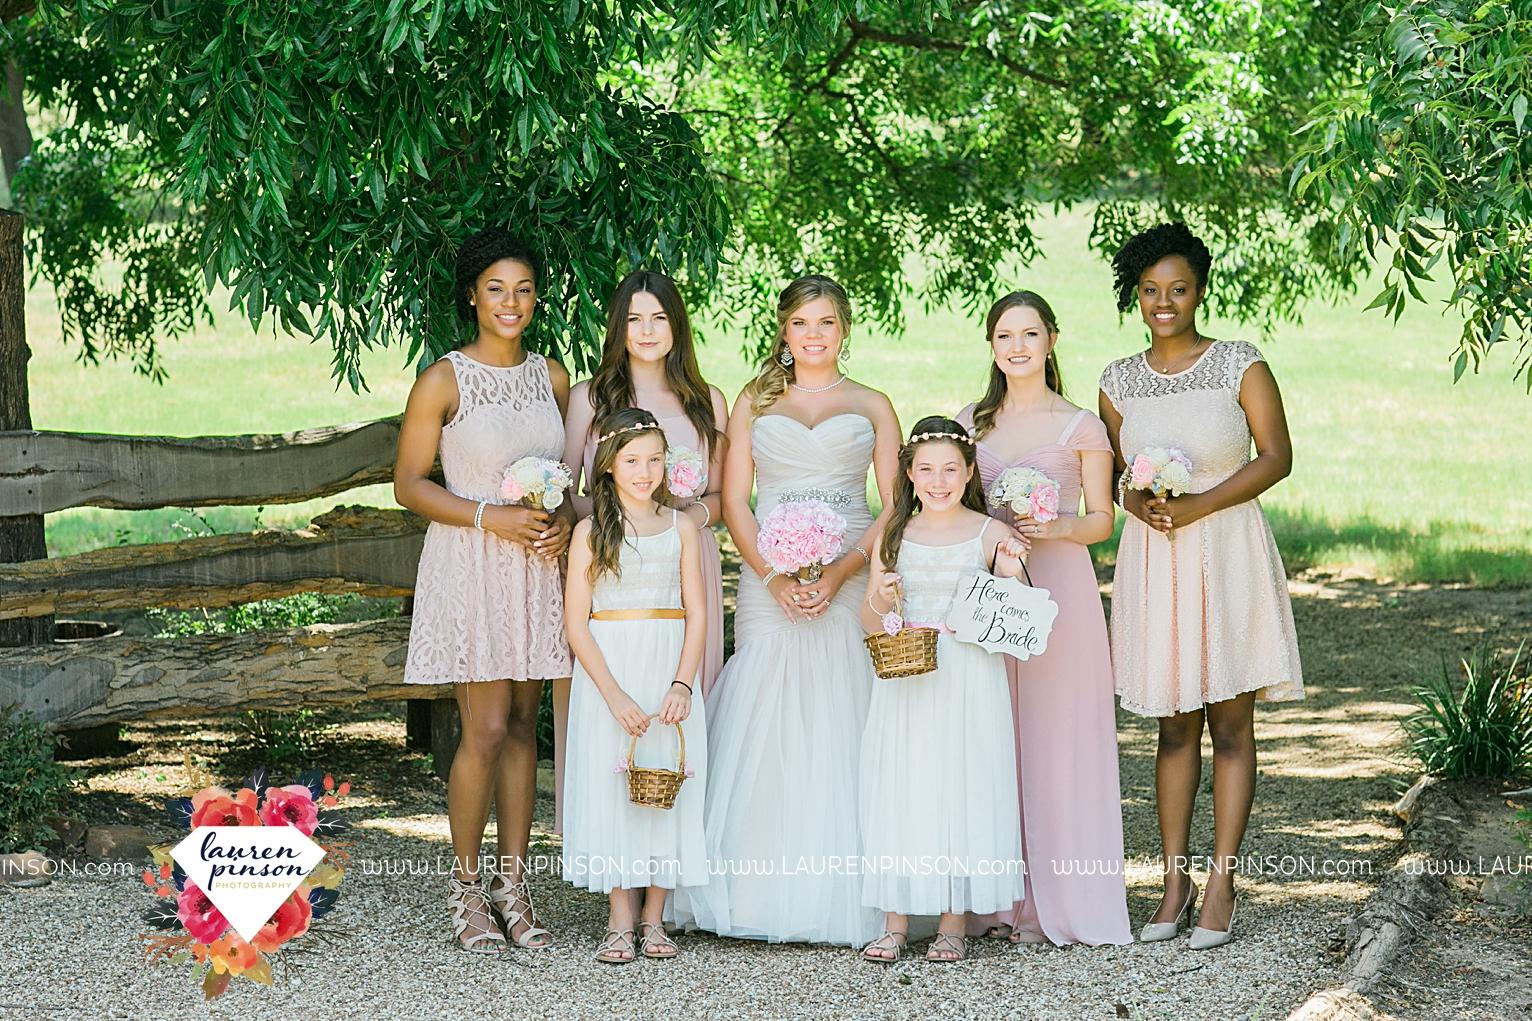 weatherford-texas-hollow-hill-farm-event-wedding-mineral-wells-dfw-wedding-photographer-wichita-falls-photography_3153.jpg